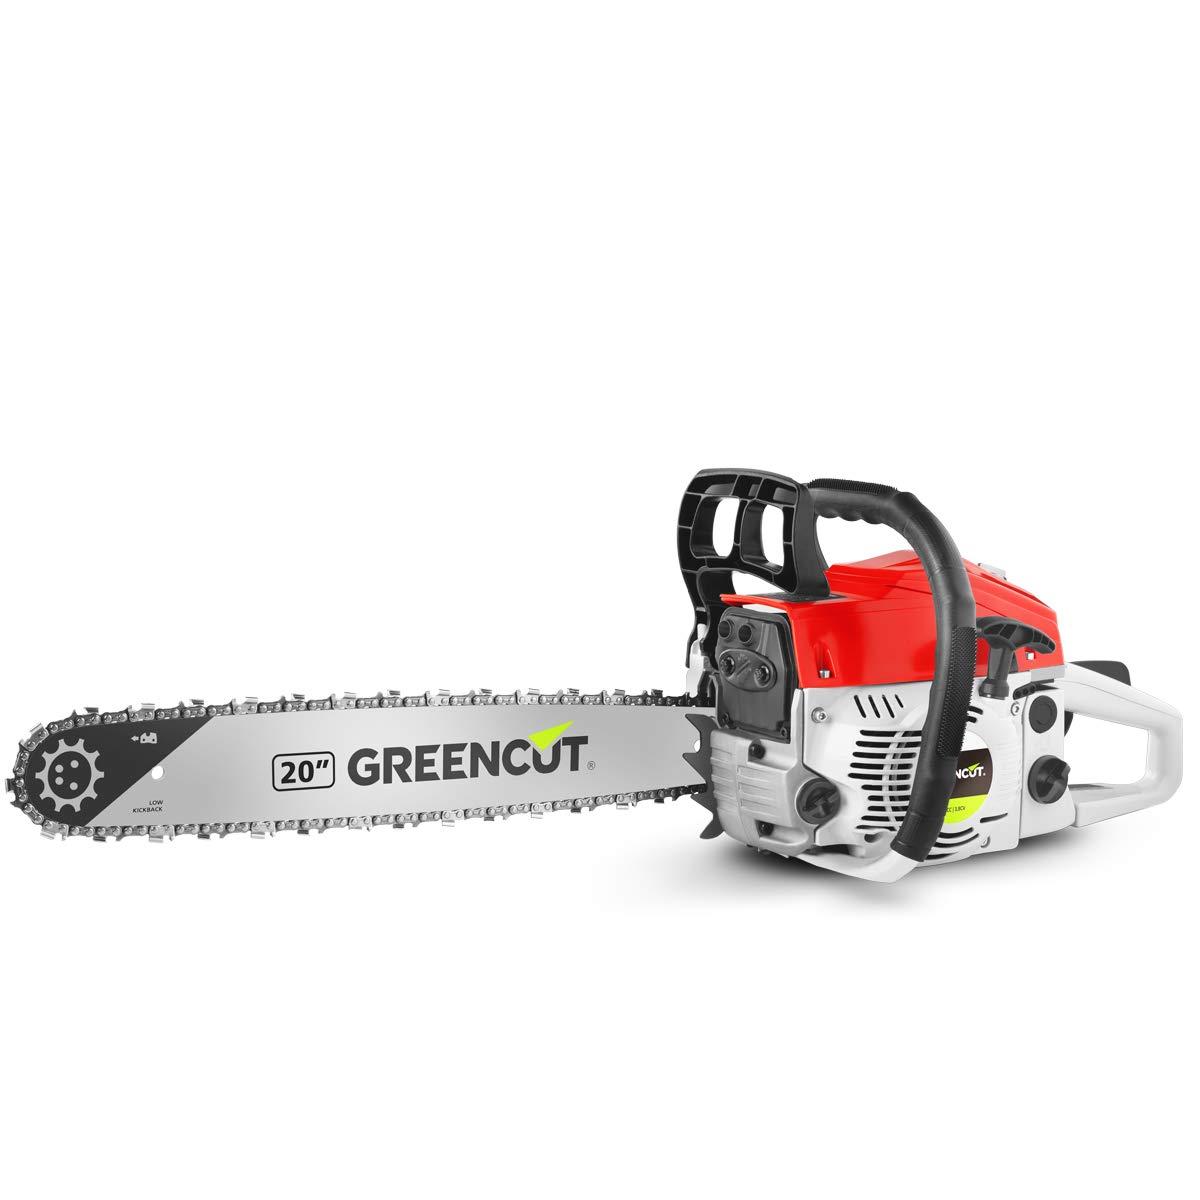 Greencut GS6200 20 - Motosierra de gasolina product image